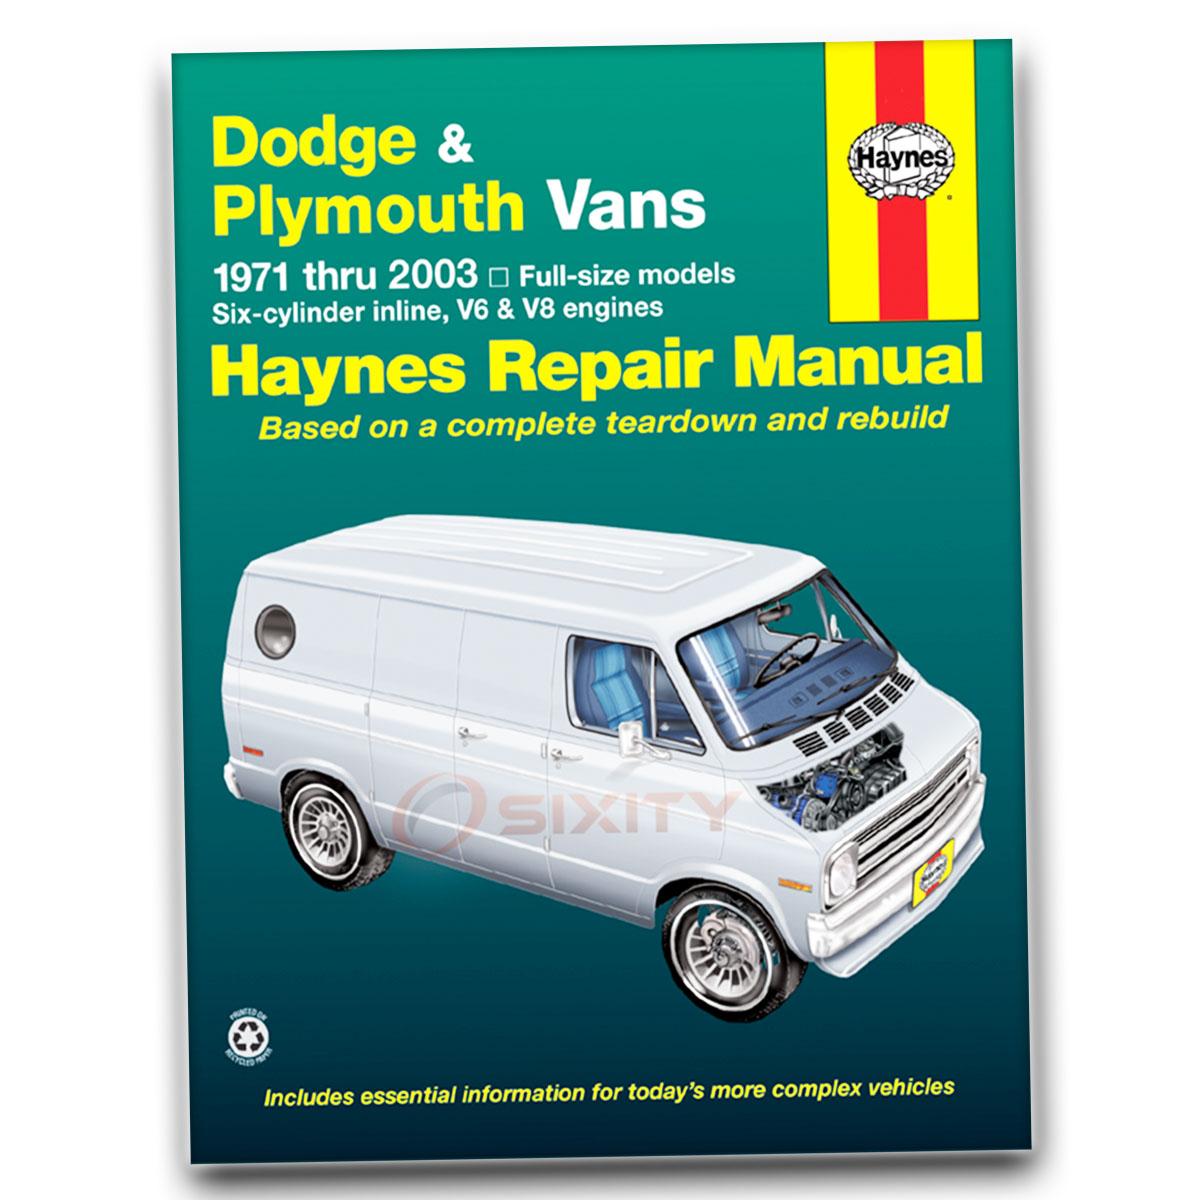 haynes repair manual for dodge b300 van sportsman base maxi wagon rh ebay  com Dodge B300. Motorhome Dodge B300 Motorhome